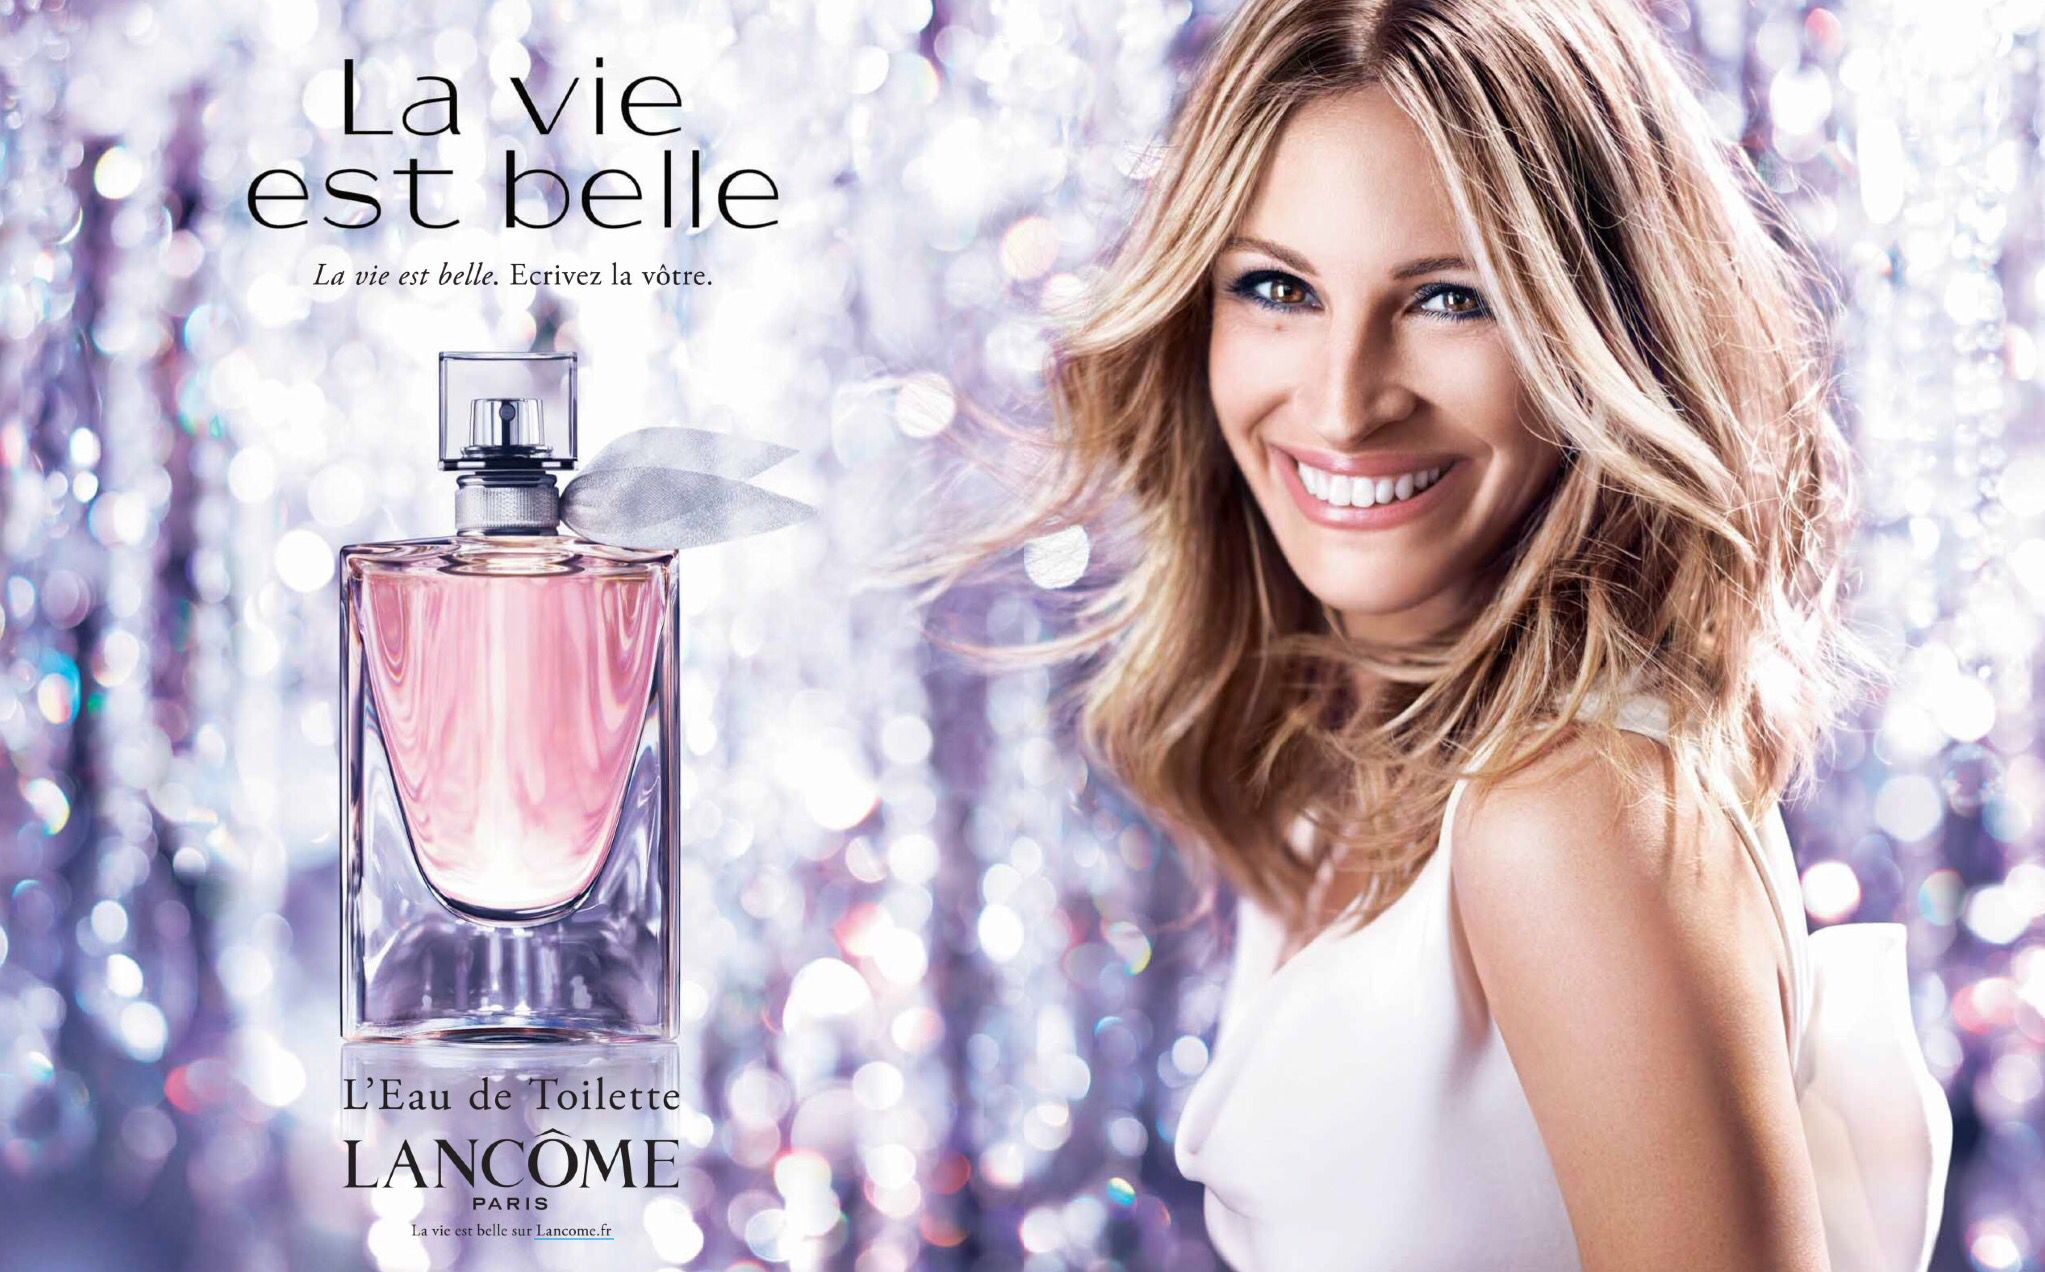 Vie Julia With Lancôme La Roberts Est Belle Perfume From Ybyf76g